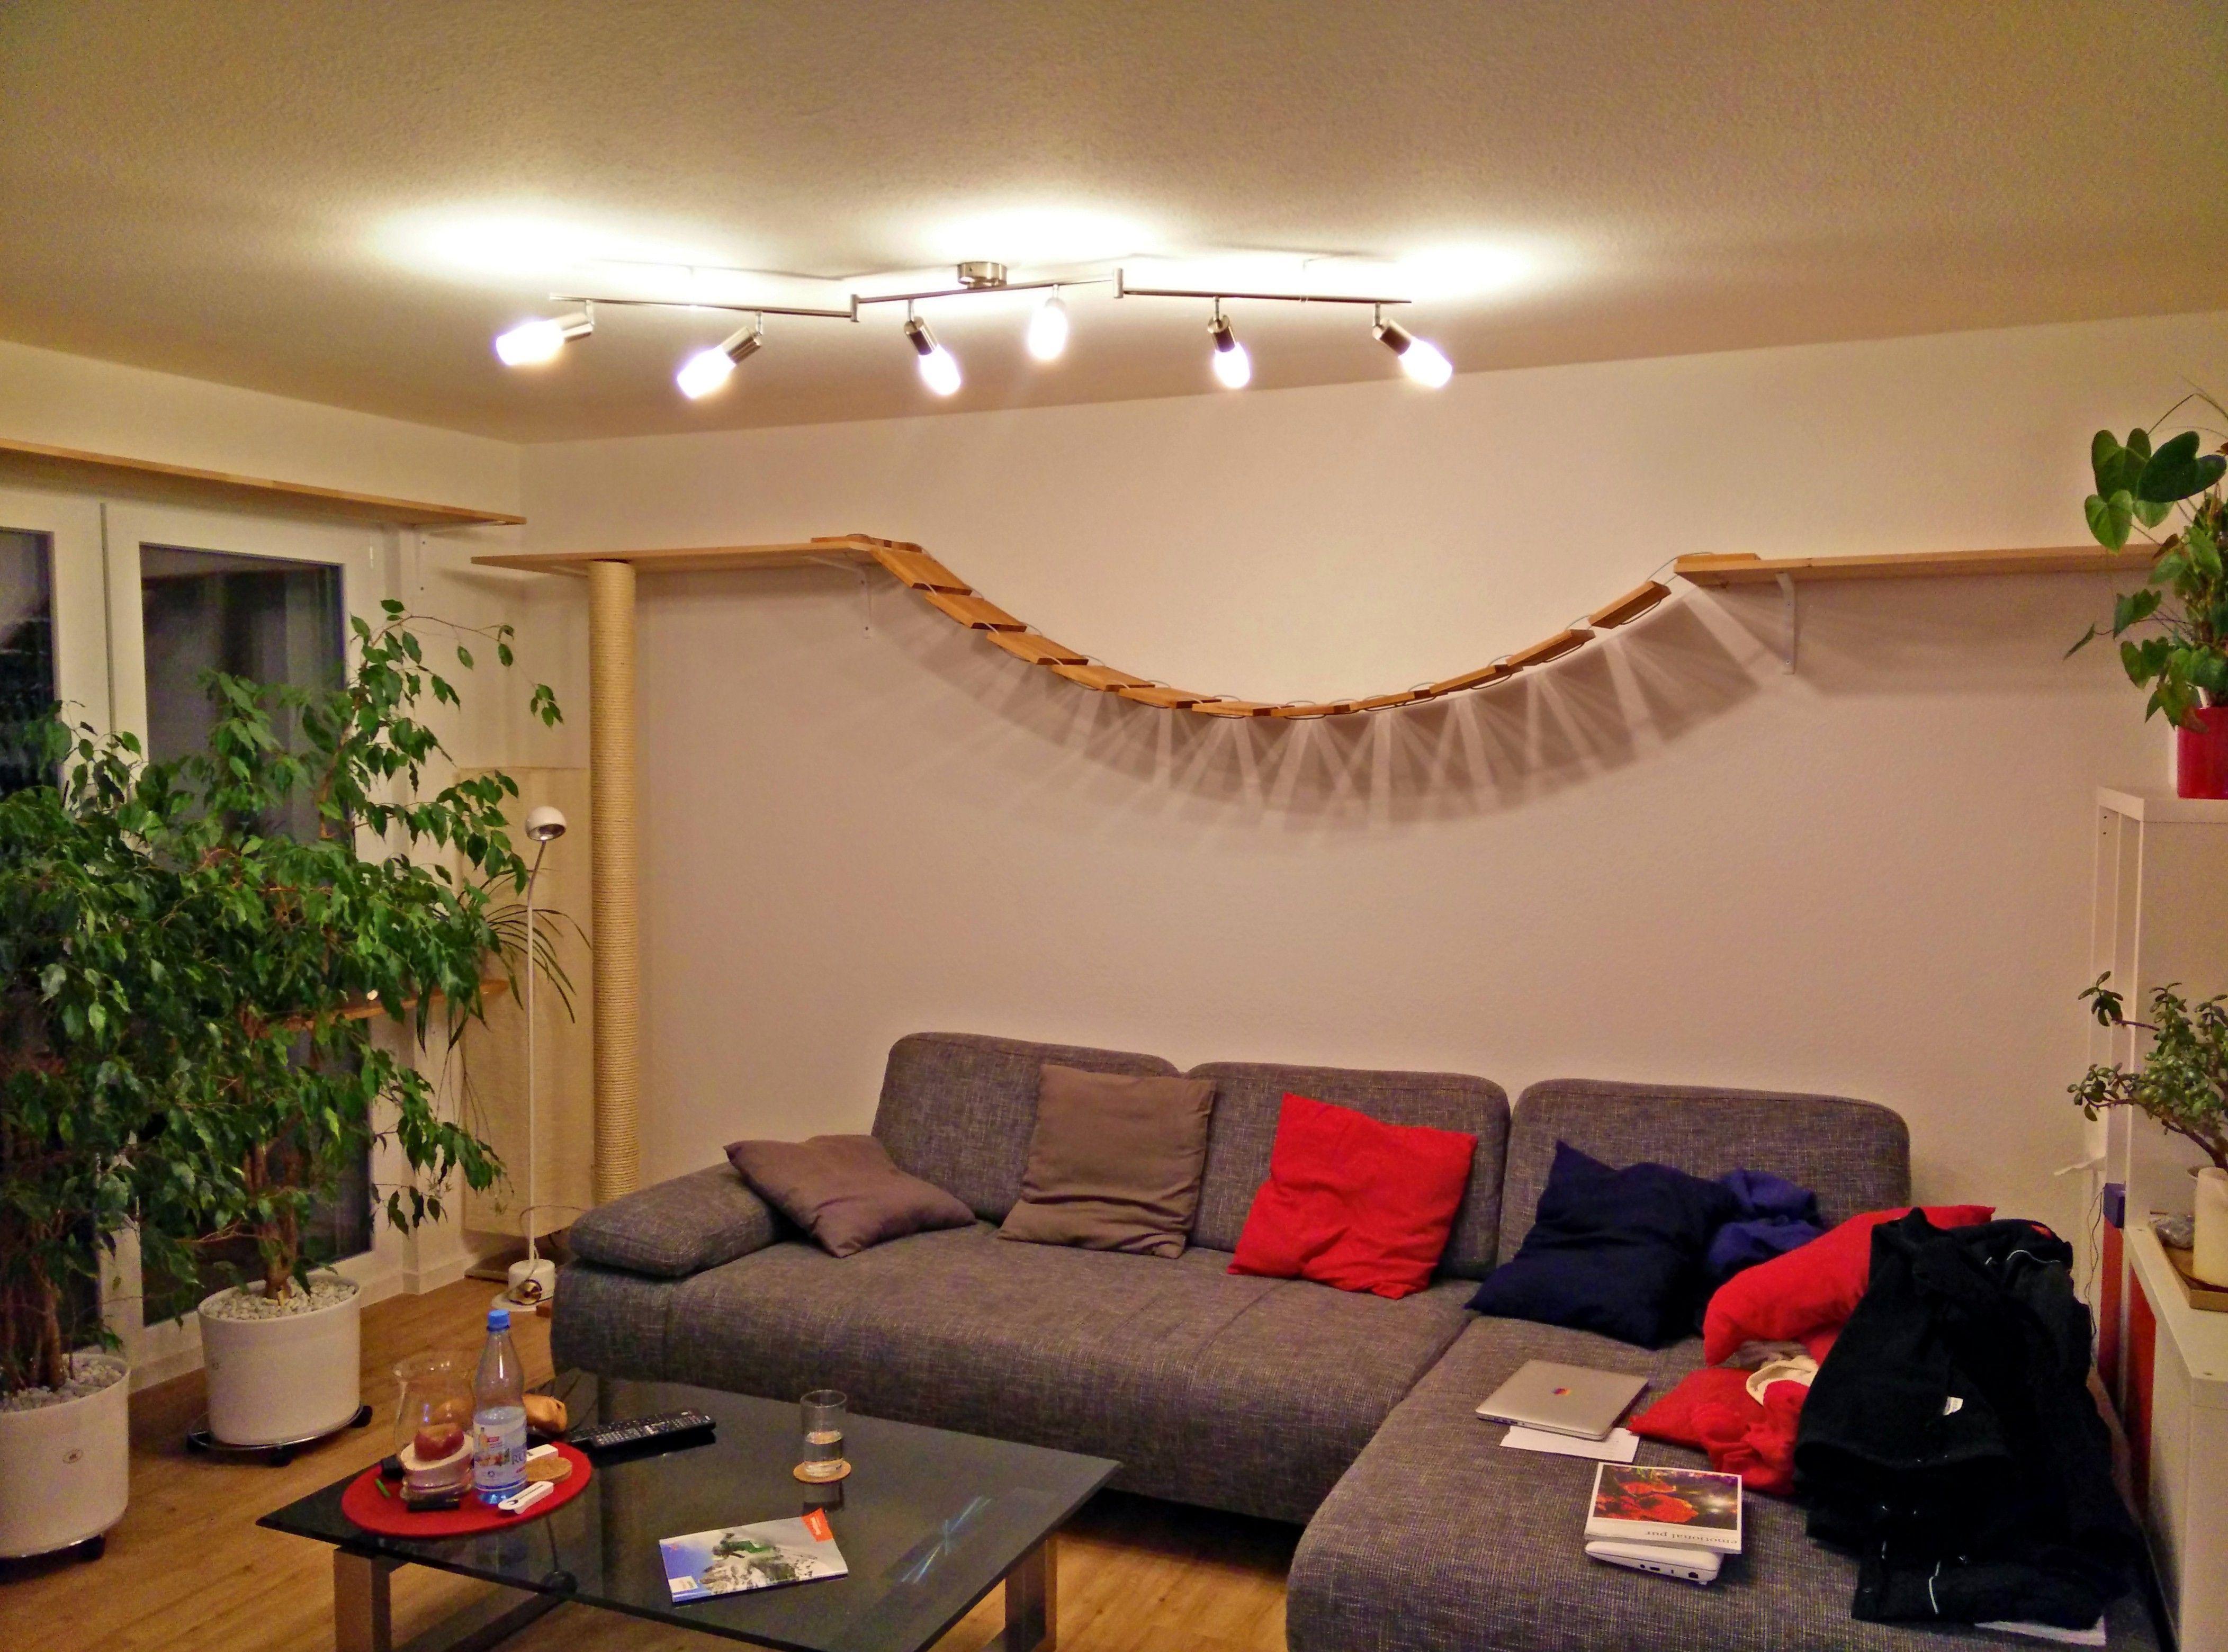 katzen archive unsere eigene wohnung lonni stachi. Black Bedroom Furniture Sets. Home Design Ideas